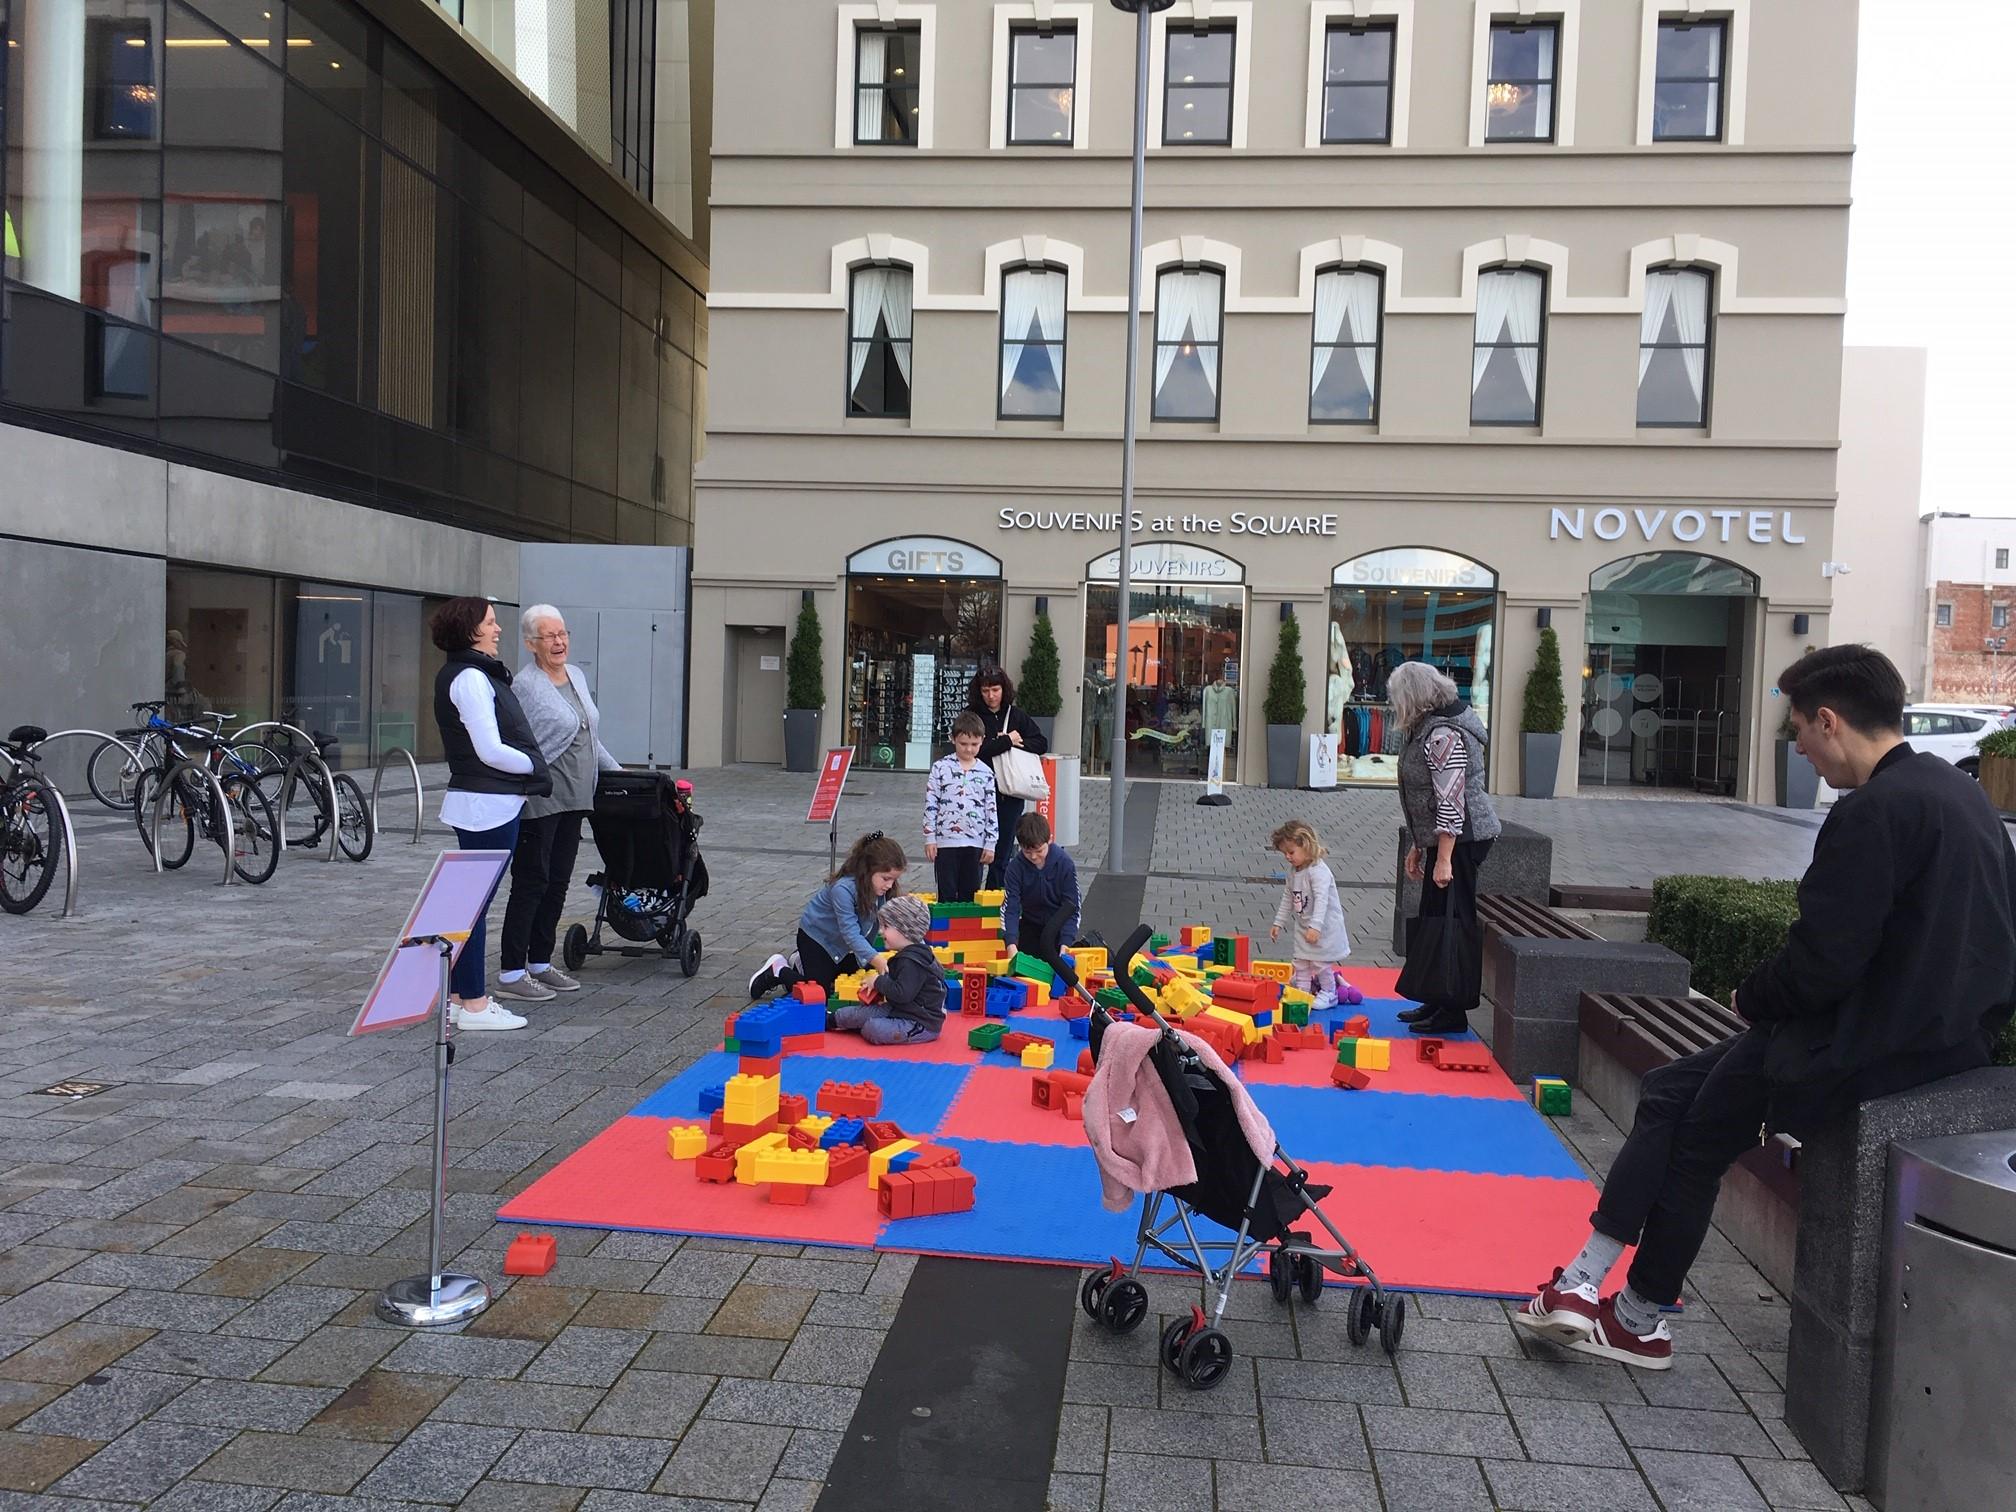 Children play on giant lego blocks on ground mats.